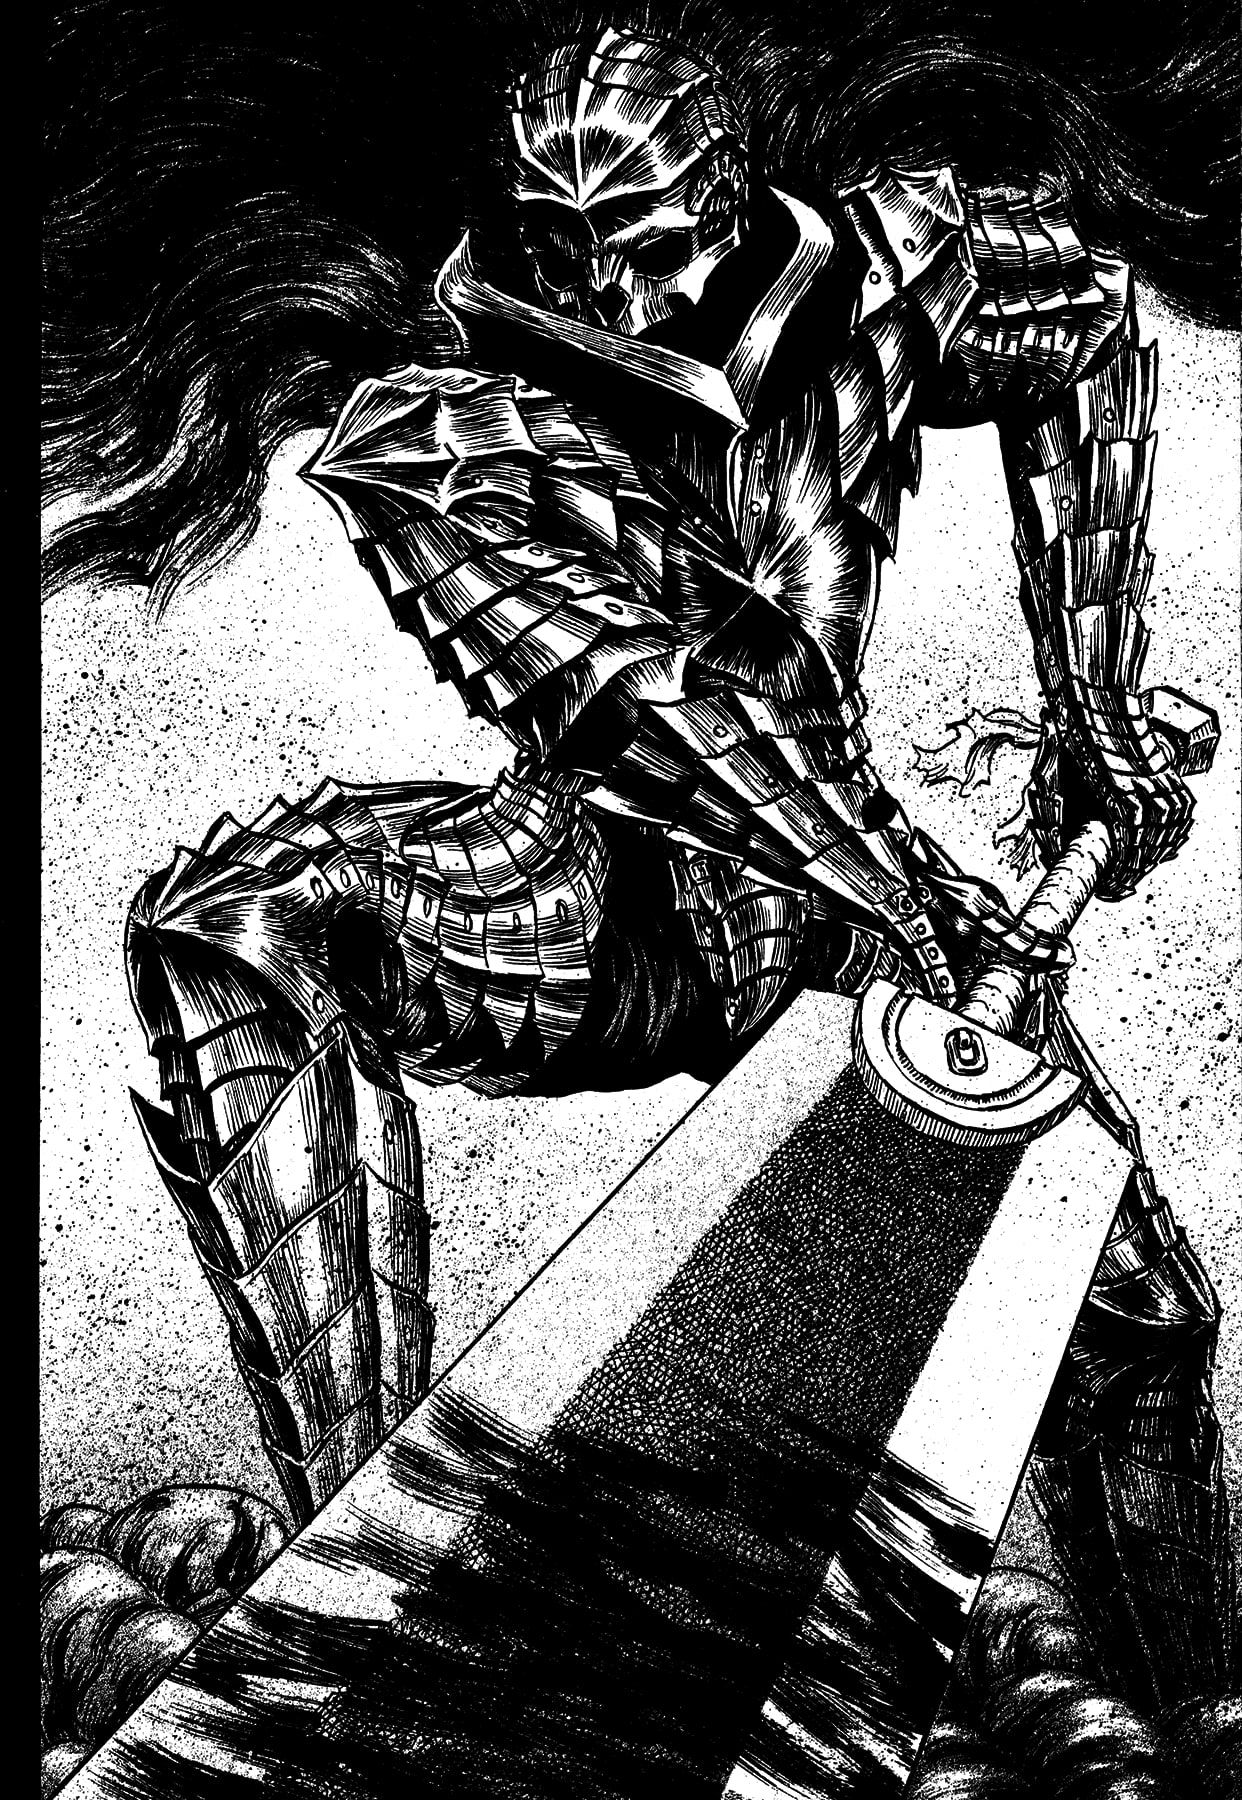 Berserk Berserk Armor Guts Kentaro Miura 720p Wallpaper Hdwallpaper Desktop Berserk Manga Anime